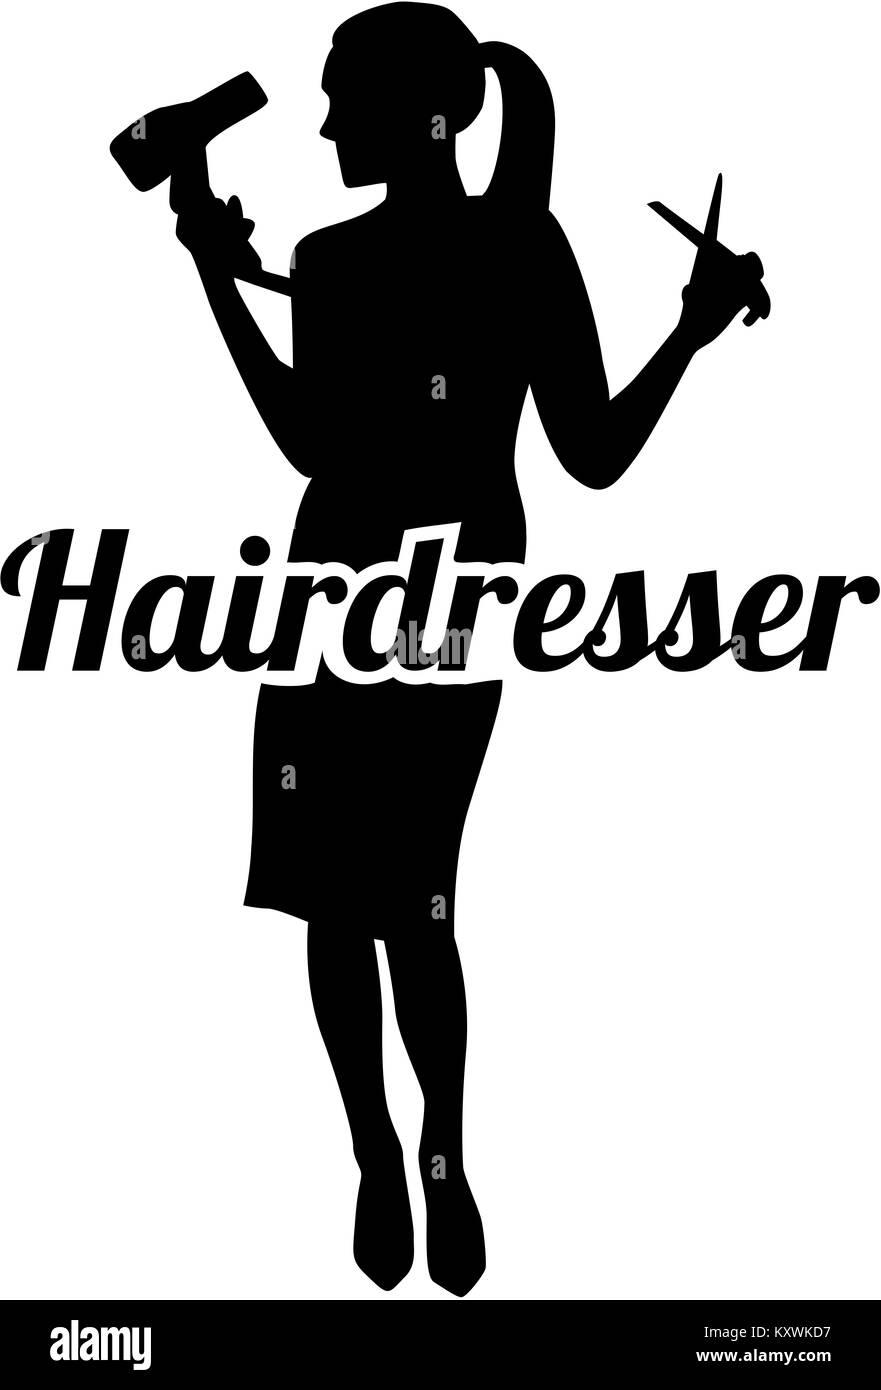 Hairdresser silhouette - Stock Image